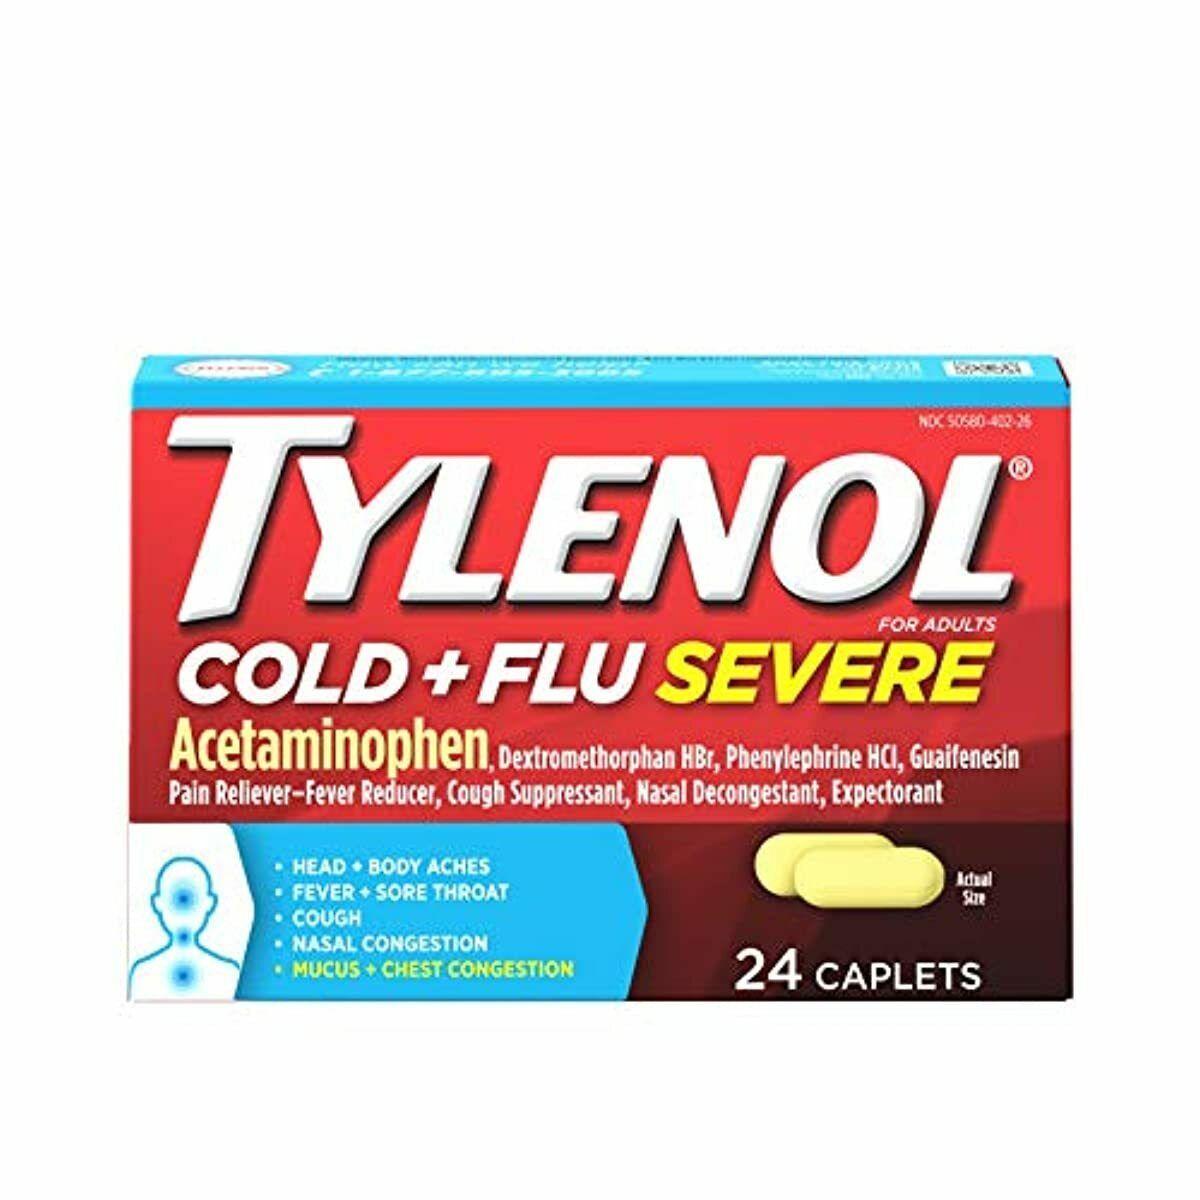 tylenol cold flu severe medicine caplets